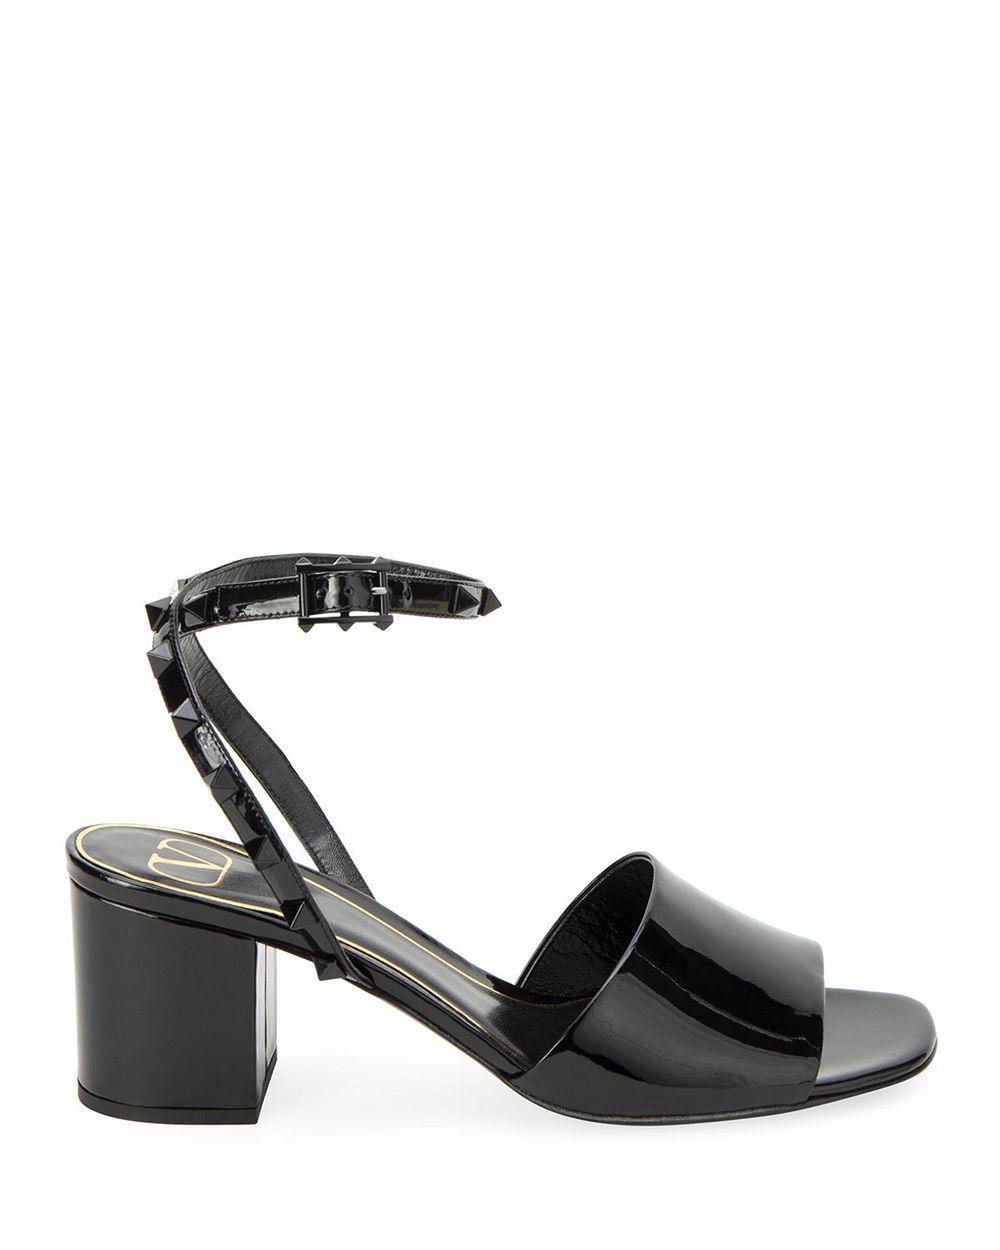 Rockstud 60mm Patent Block Heel Sandal Item # UW2S0AD1VNZ